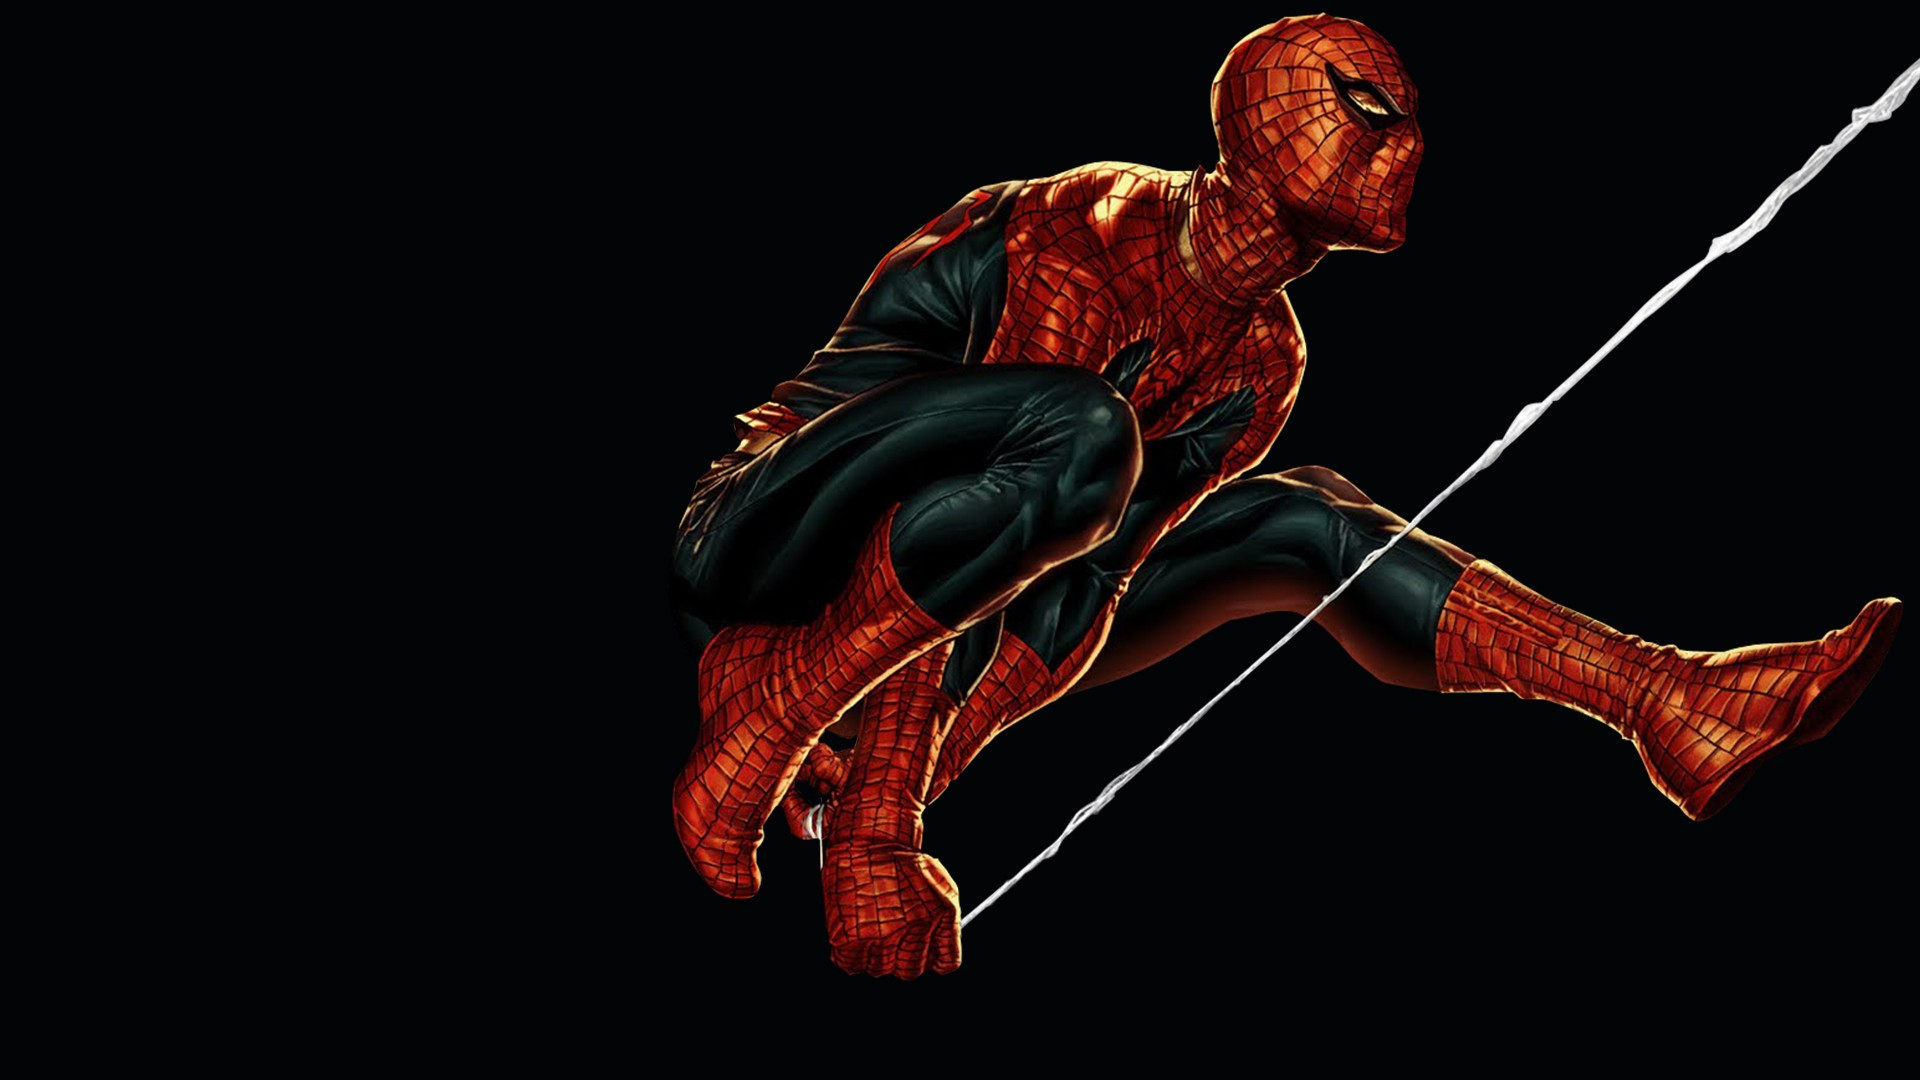 45+ Spiderman Wallpaper 1920x1080 on WallpaperSafari